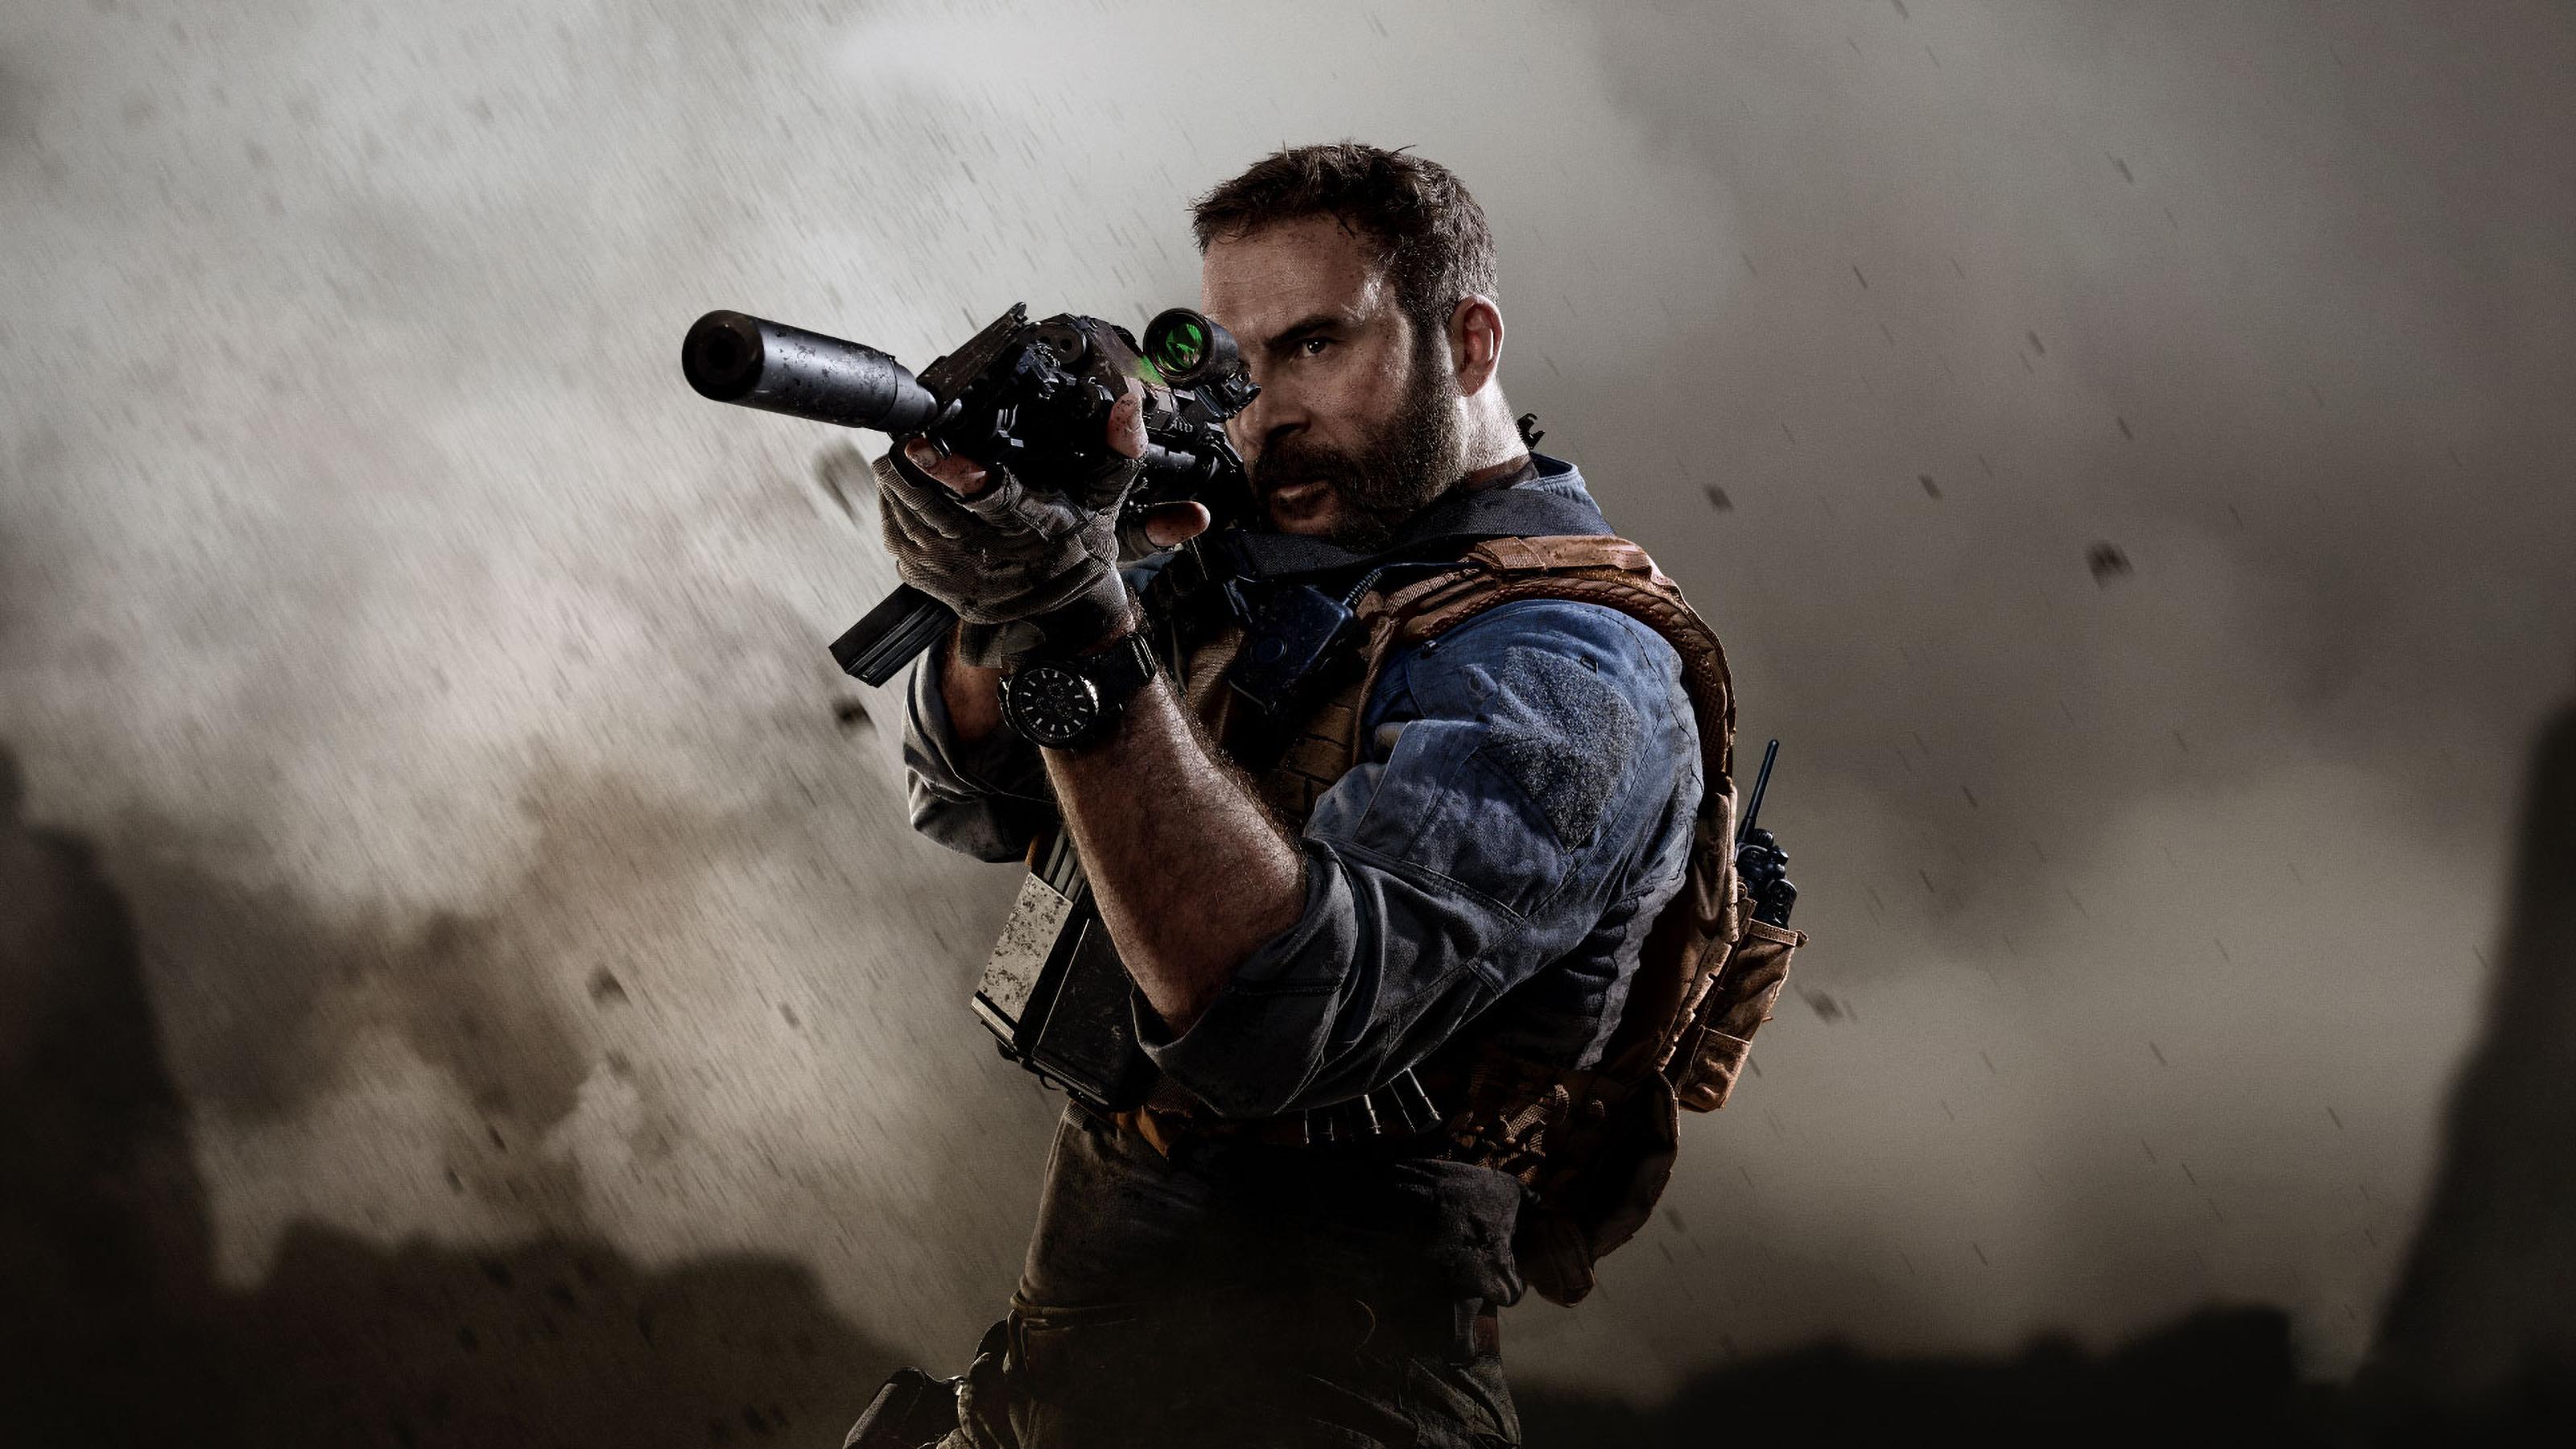 Call of Duty Modern Warfare Game Wallpaper, HD Games 4K ...